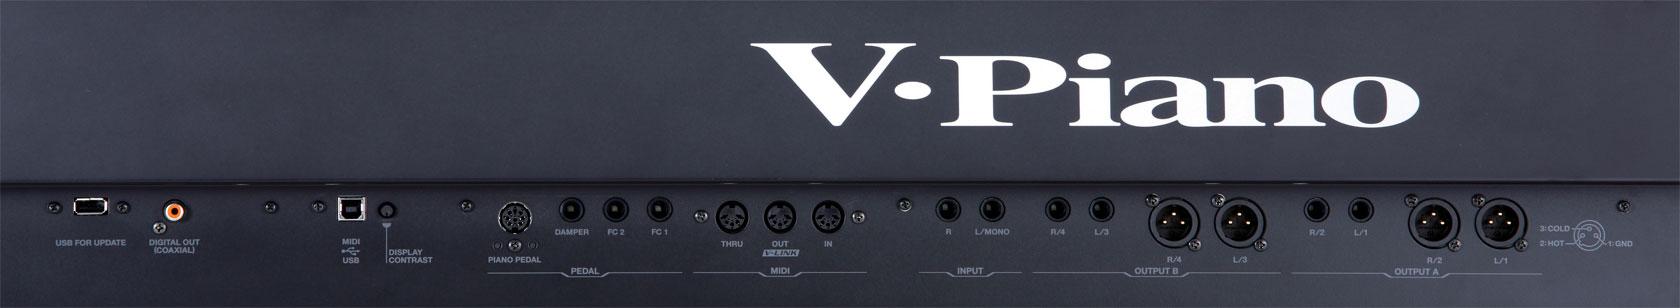 v_piano_inputs_gal